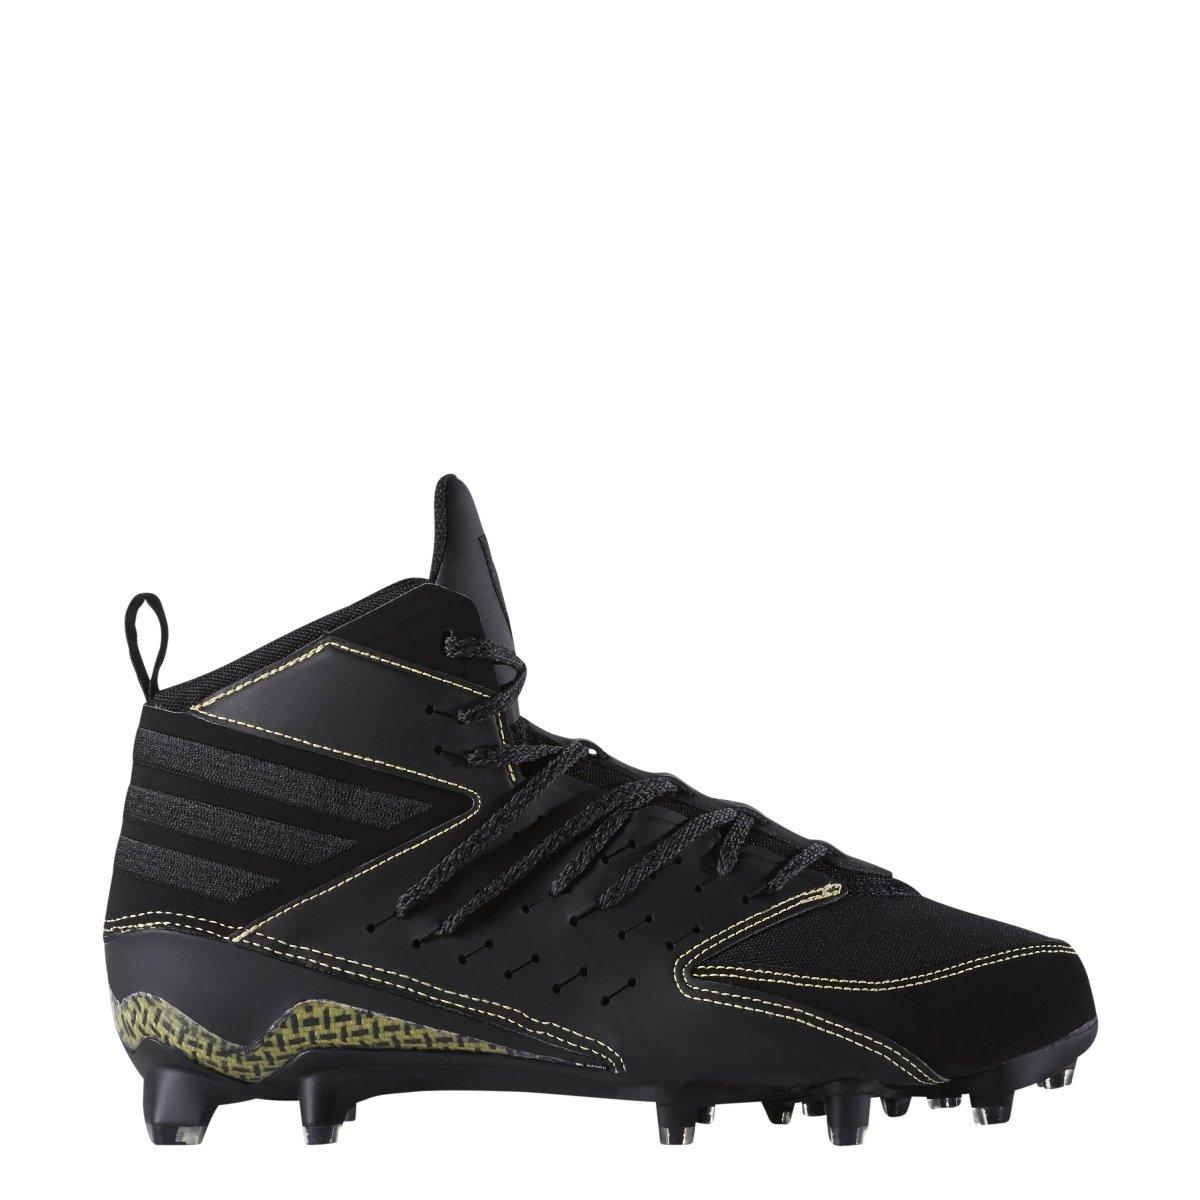 adidas Dark Ops Freak X Kevlar Cleat - Men's Football 10.5 Core Black/Core Black/Grey by adidas